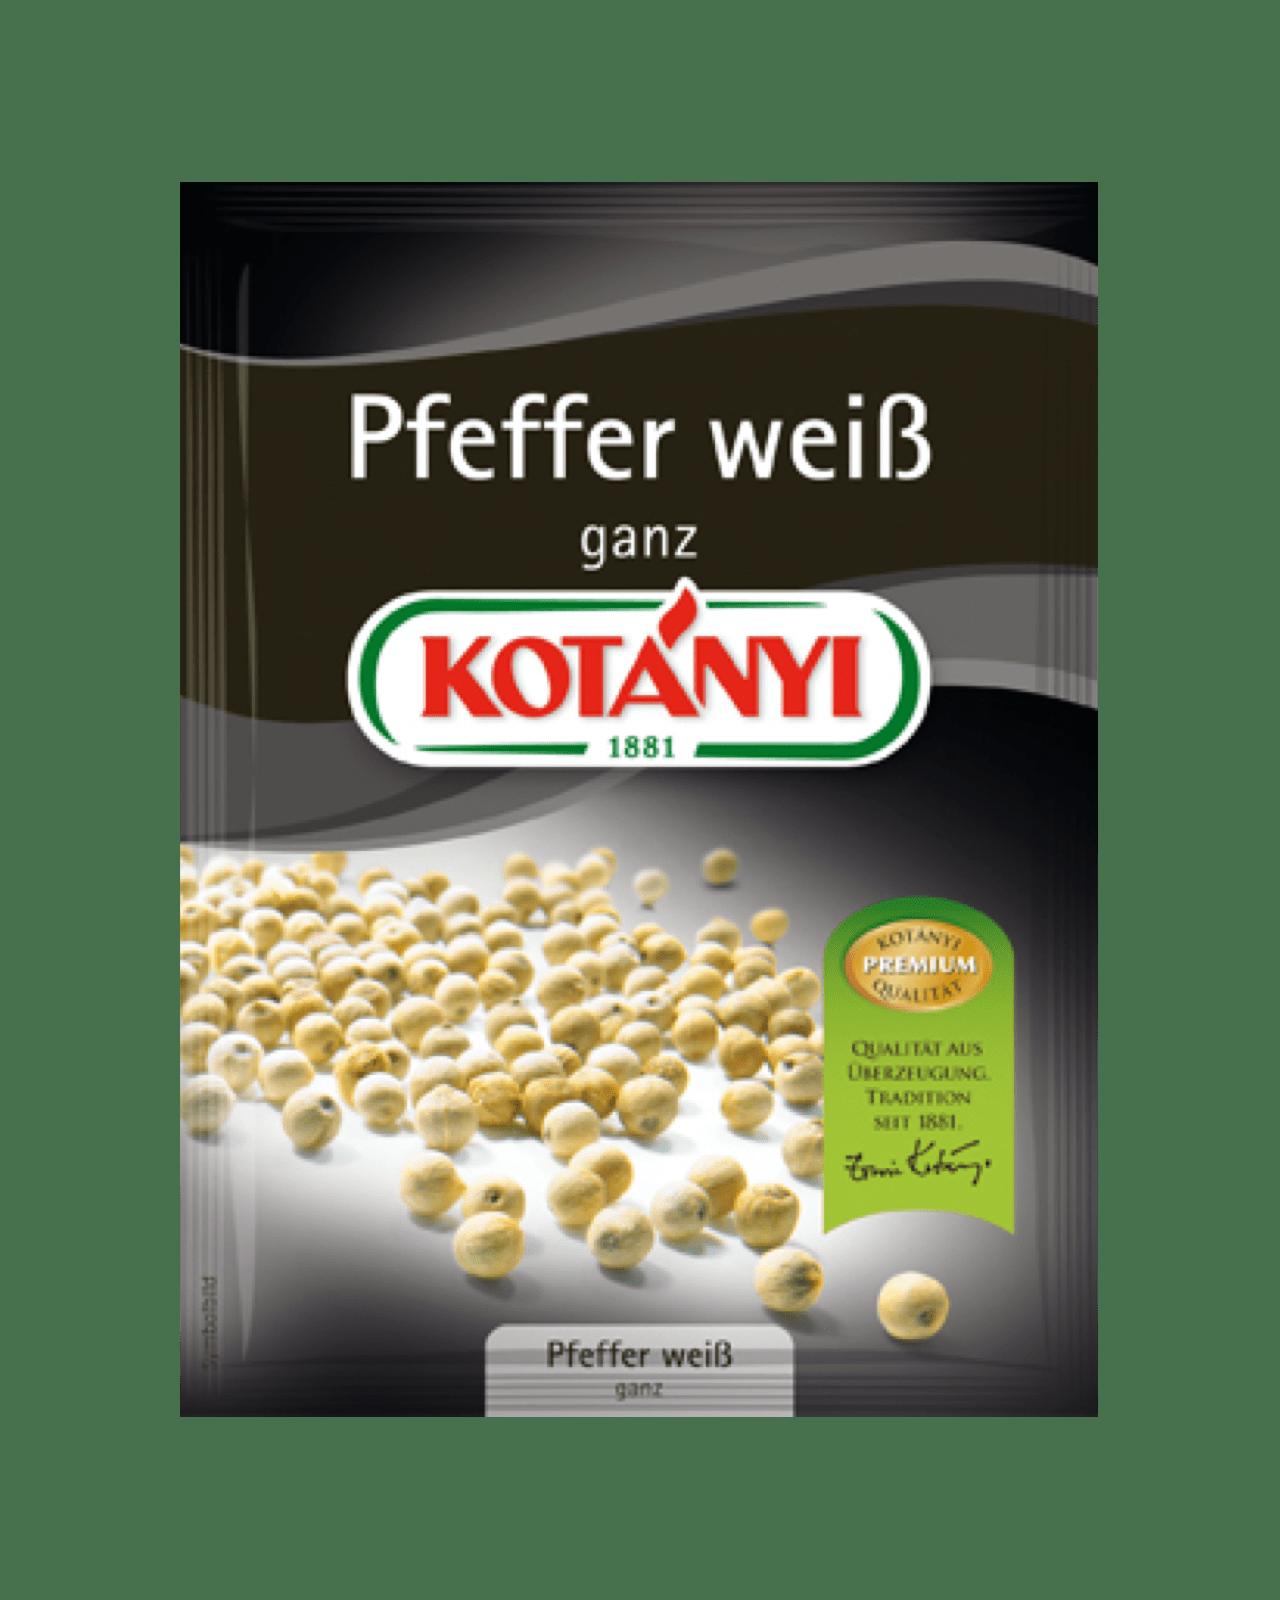 Kotányi Pfeffer weiss ganz im Brief